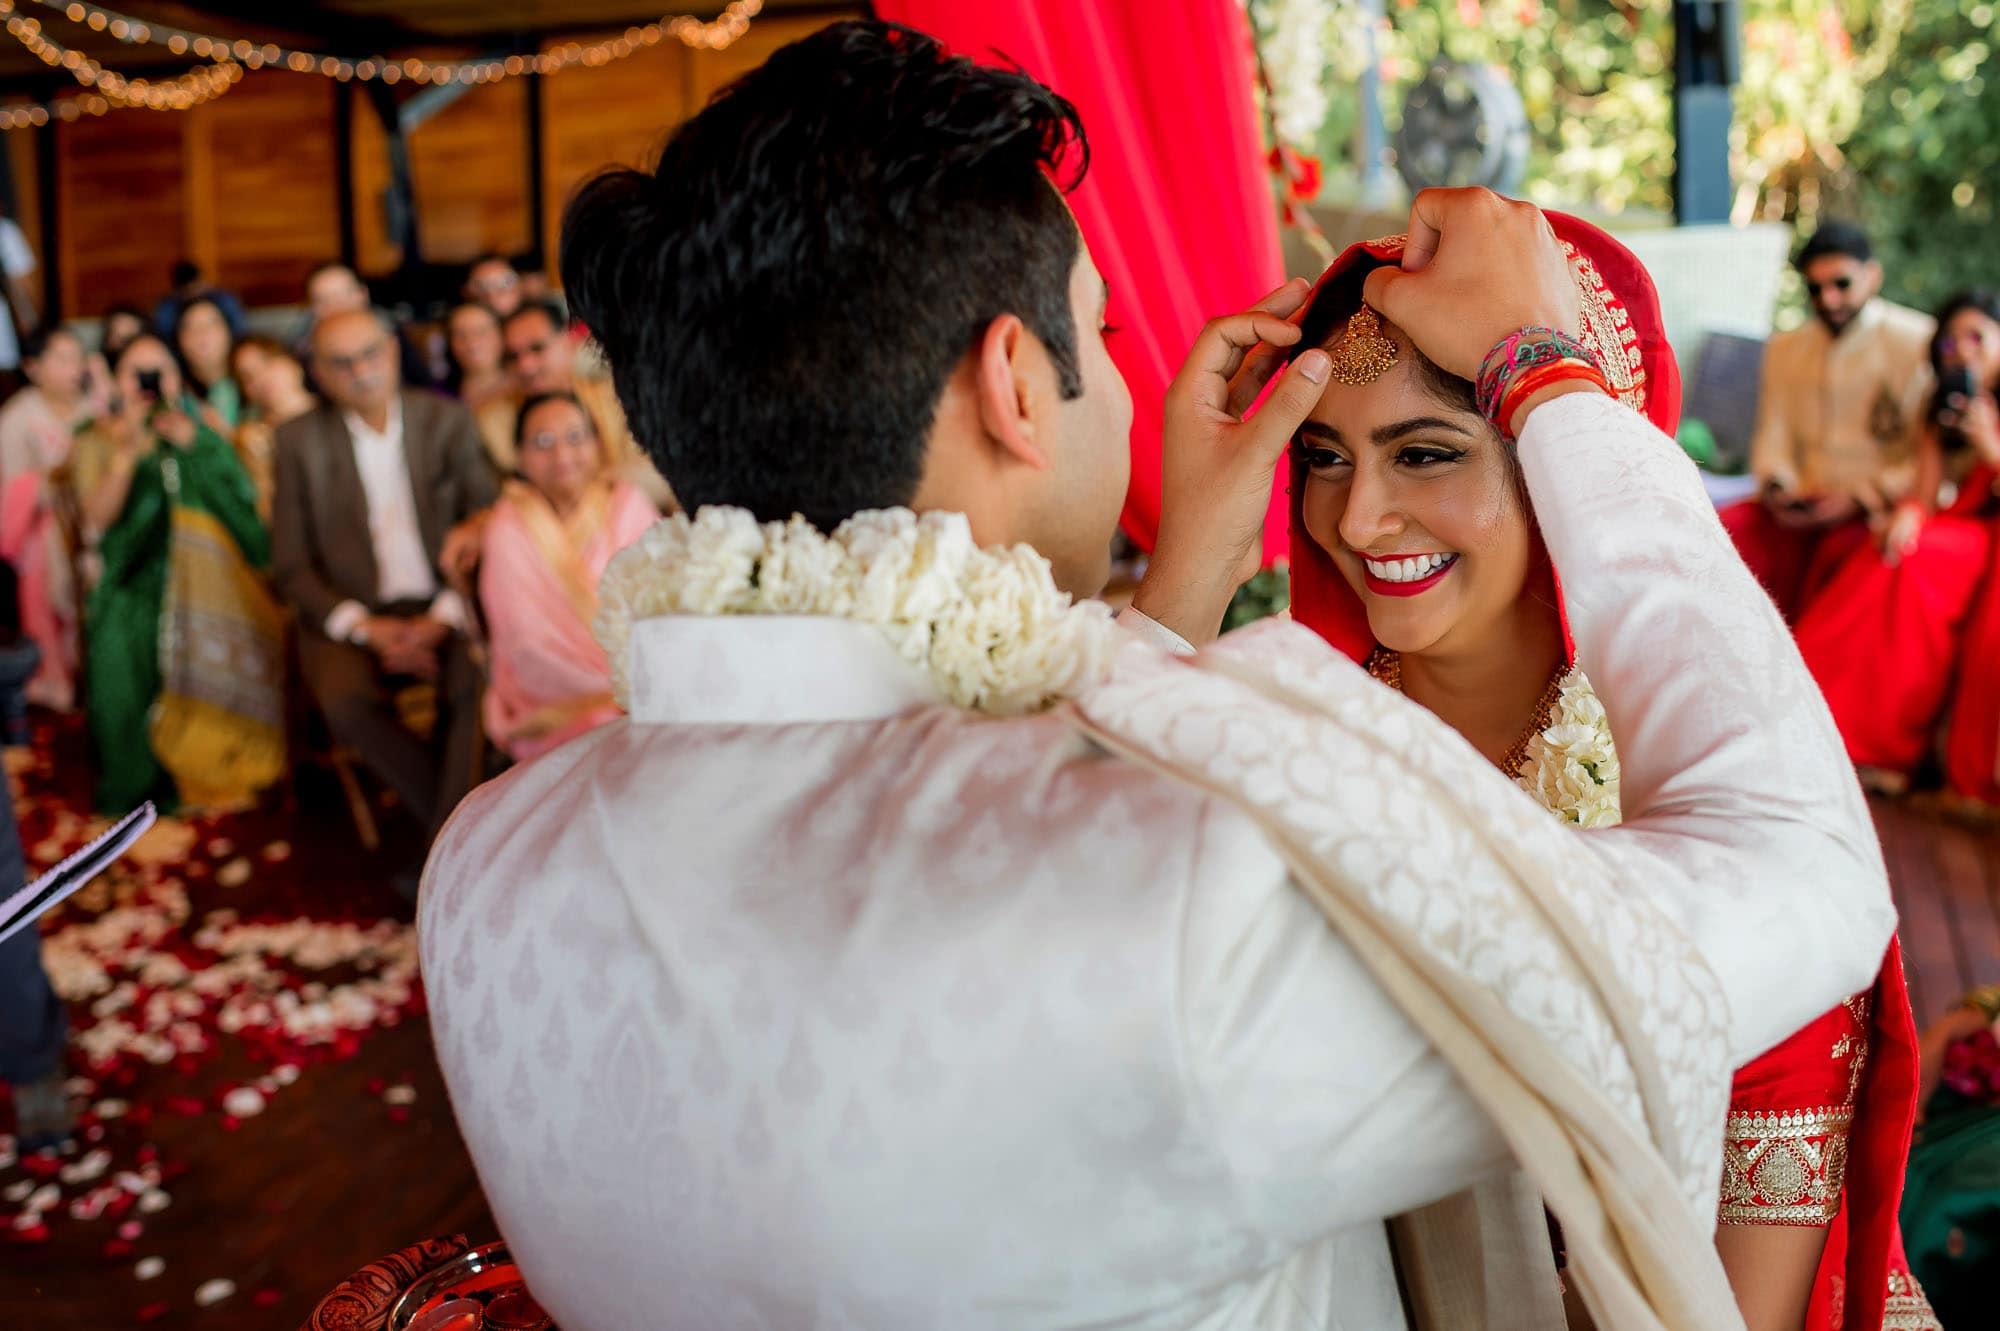 The groom adjusts the bride's headpiece